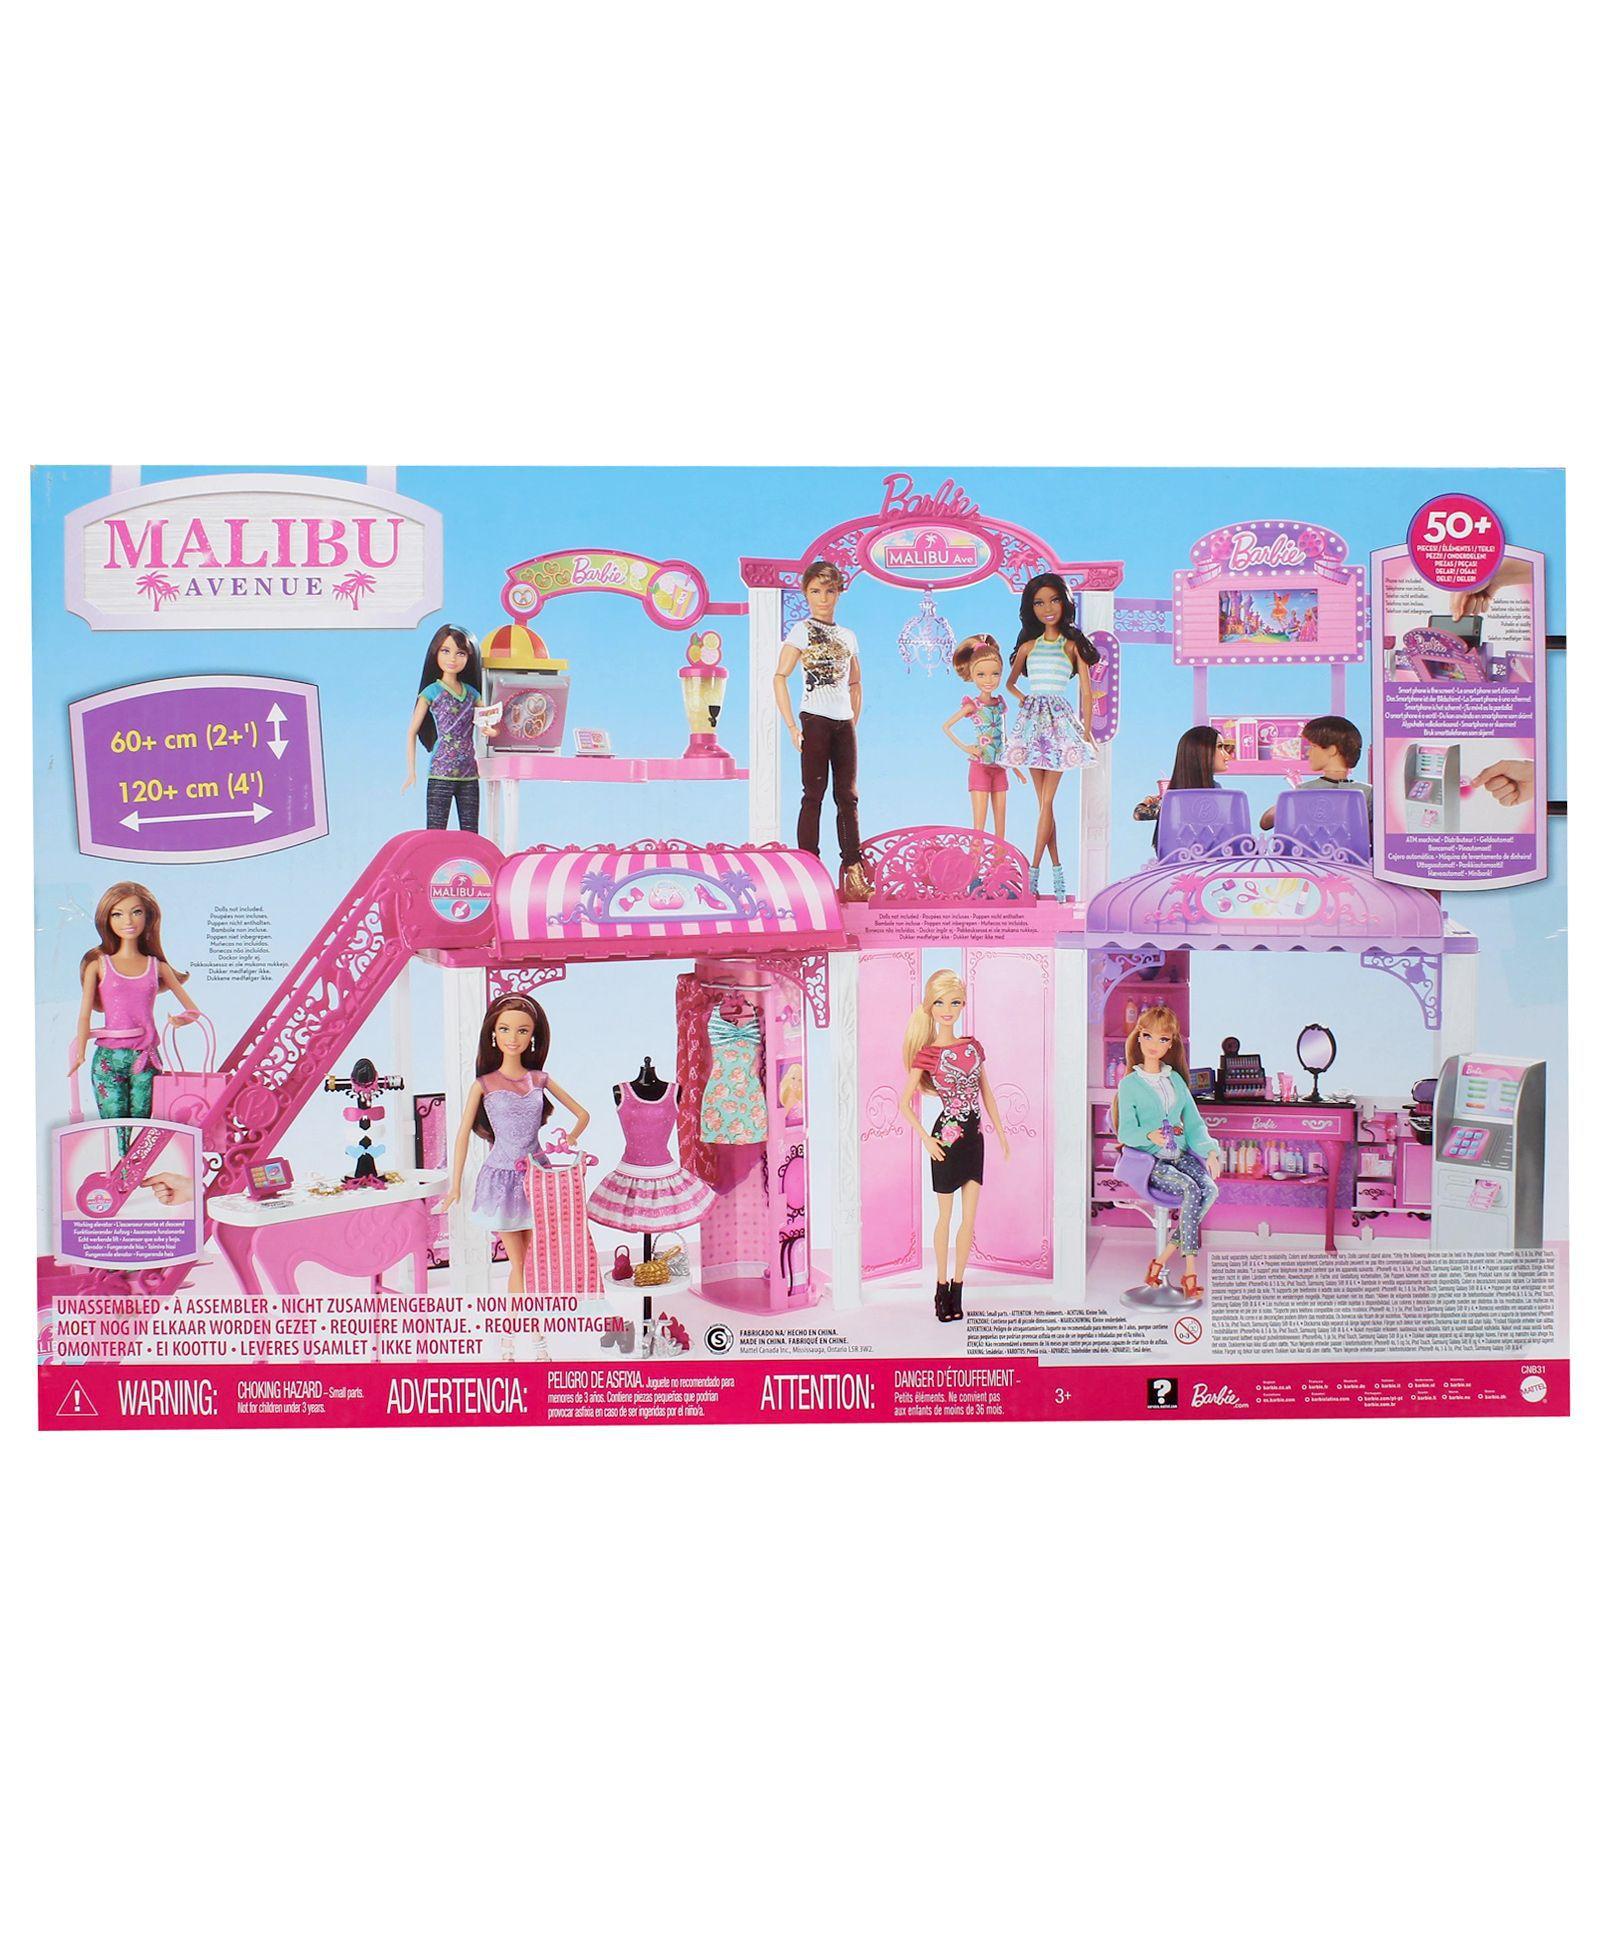 Barbie Malibu Avenue Mall Buy Barbie Malibu Avenue Mall line at